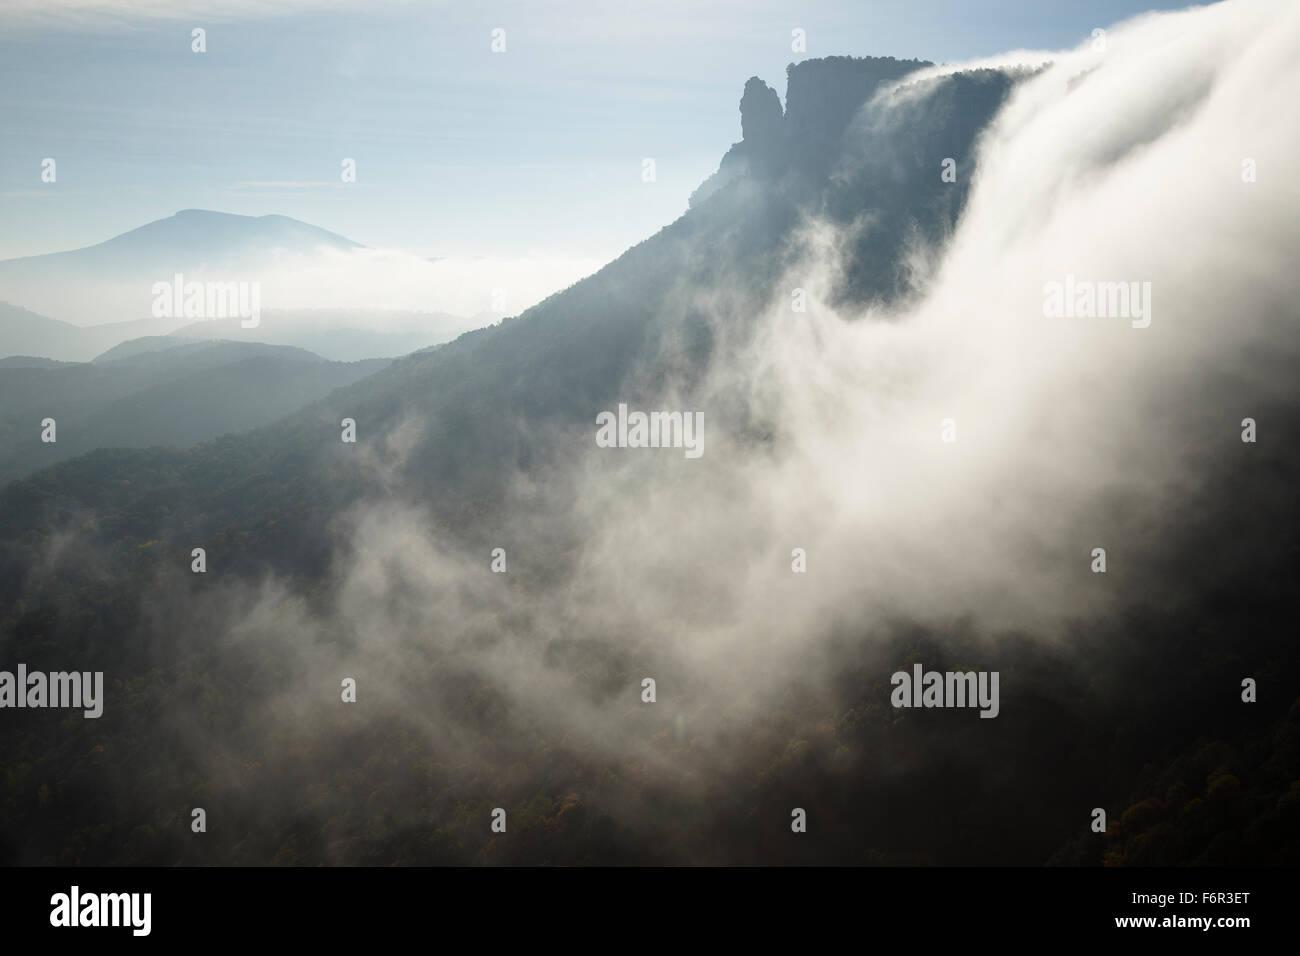 Le brouillard. Cascade Sallent de sel. Rupit. La région d'Osona. Barcelone. Cataluña. L'Espagne. Photo Stock